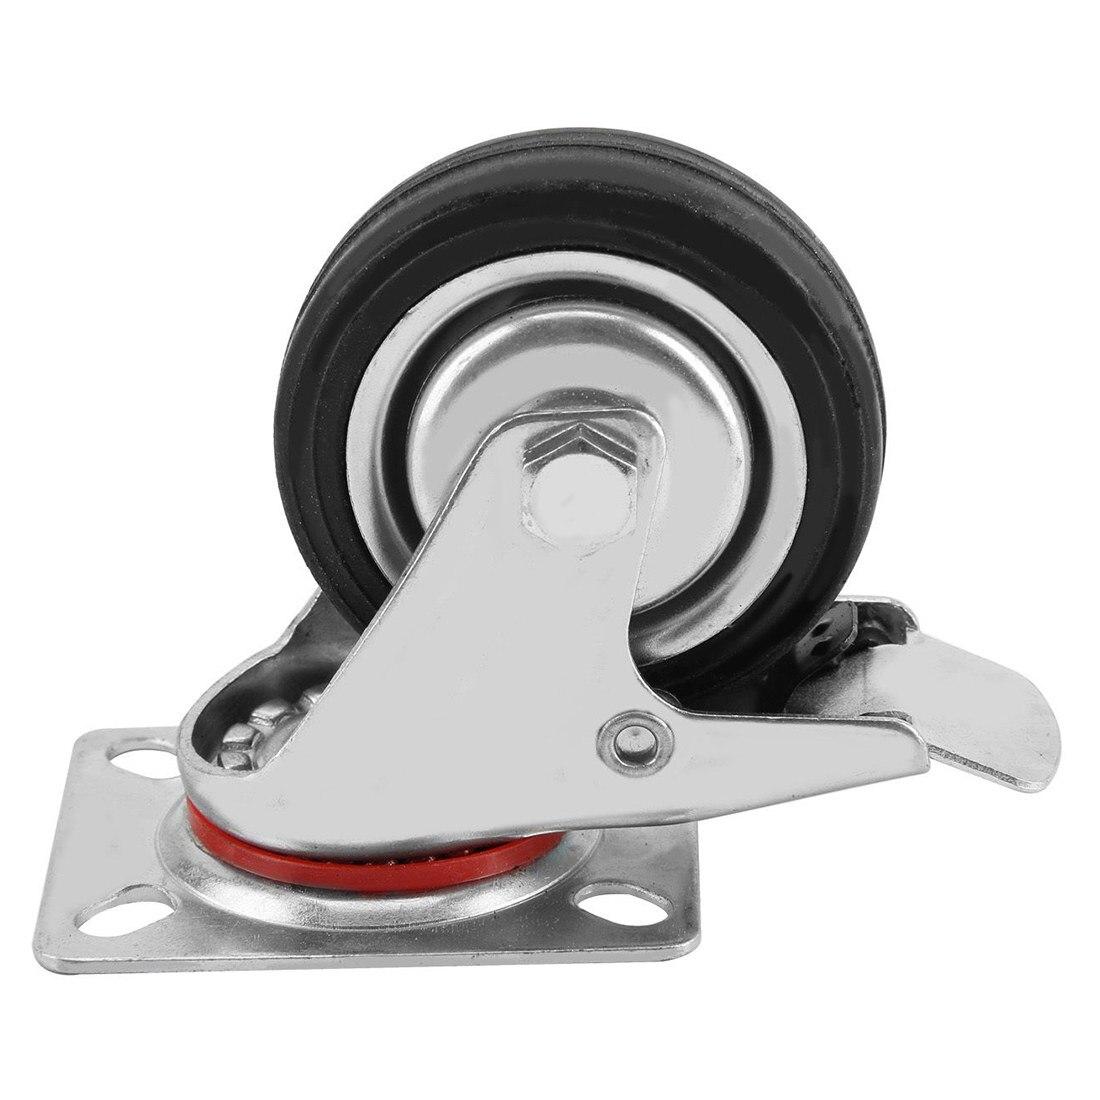 High Quality 4x75mm New Heavy Duty Rubber Swivel Castor Wheels Brake Trolley Furniture Caster 4 pcs heavy duty 200kg 50mm swivel castor wheels trolley furniture caster rubber